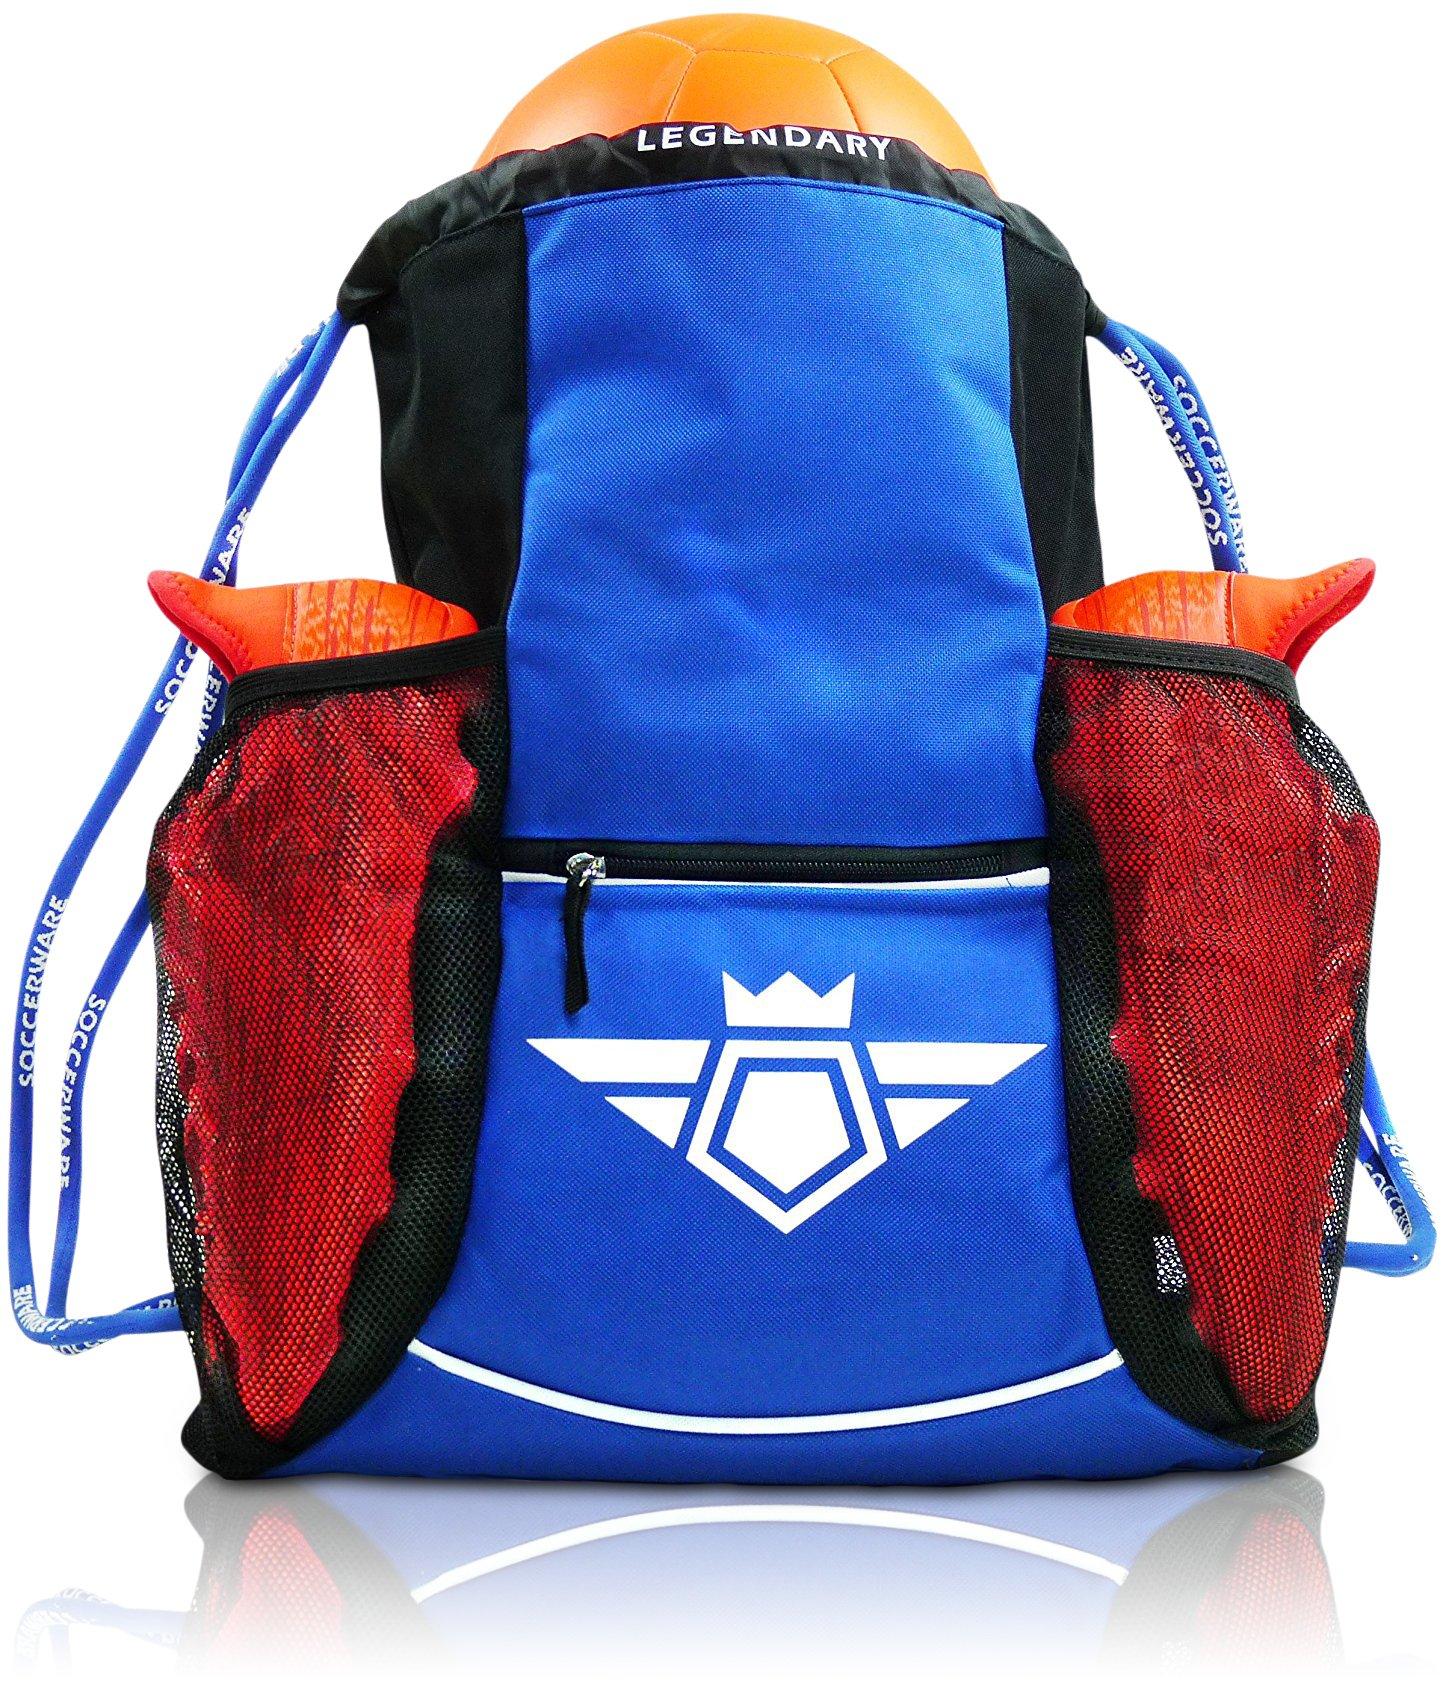 Soccer Bag Backpack - Organize Sports Gym Equipment - Boys Girls product  image 670ed296adcd3